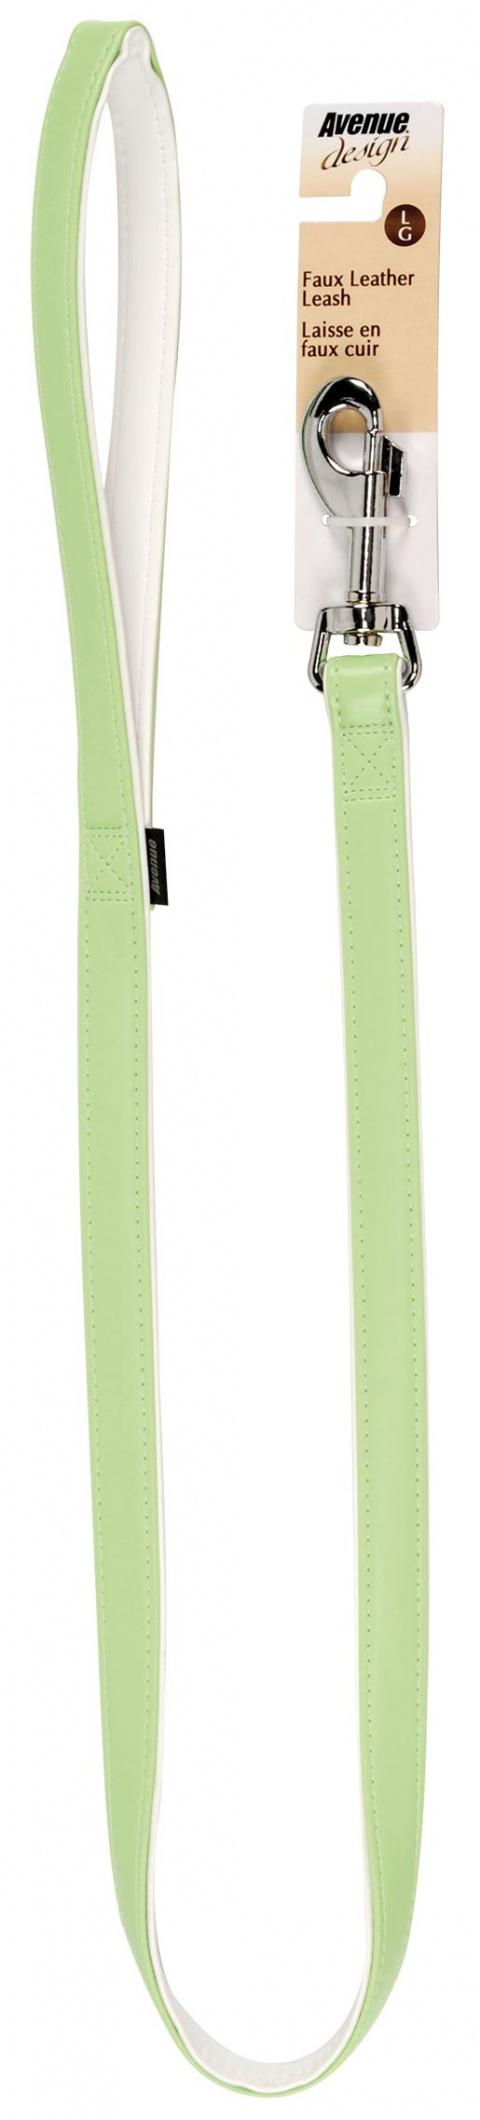 Vodítko AVENUE Elegance zelené 100 x 2 cm